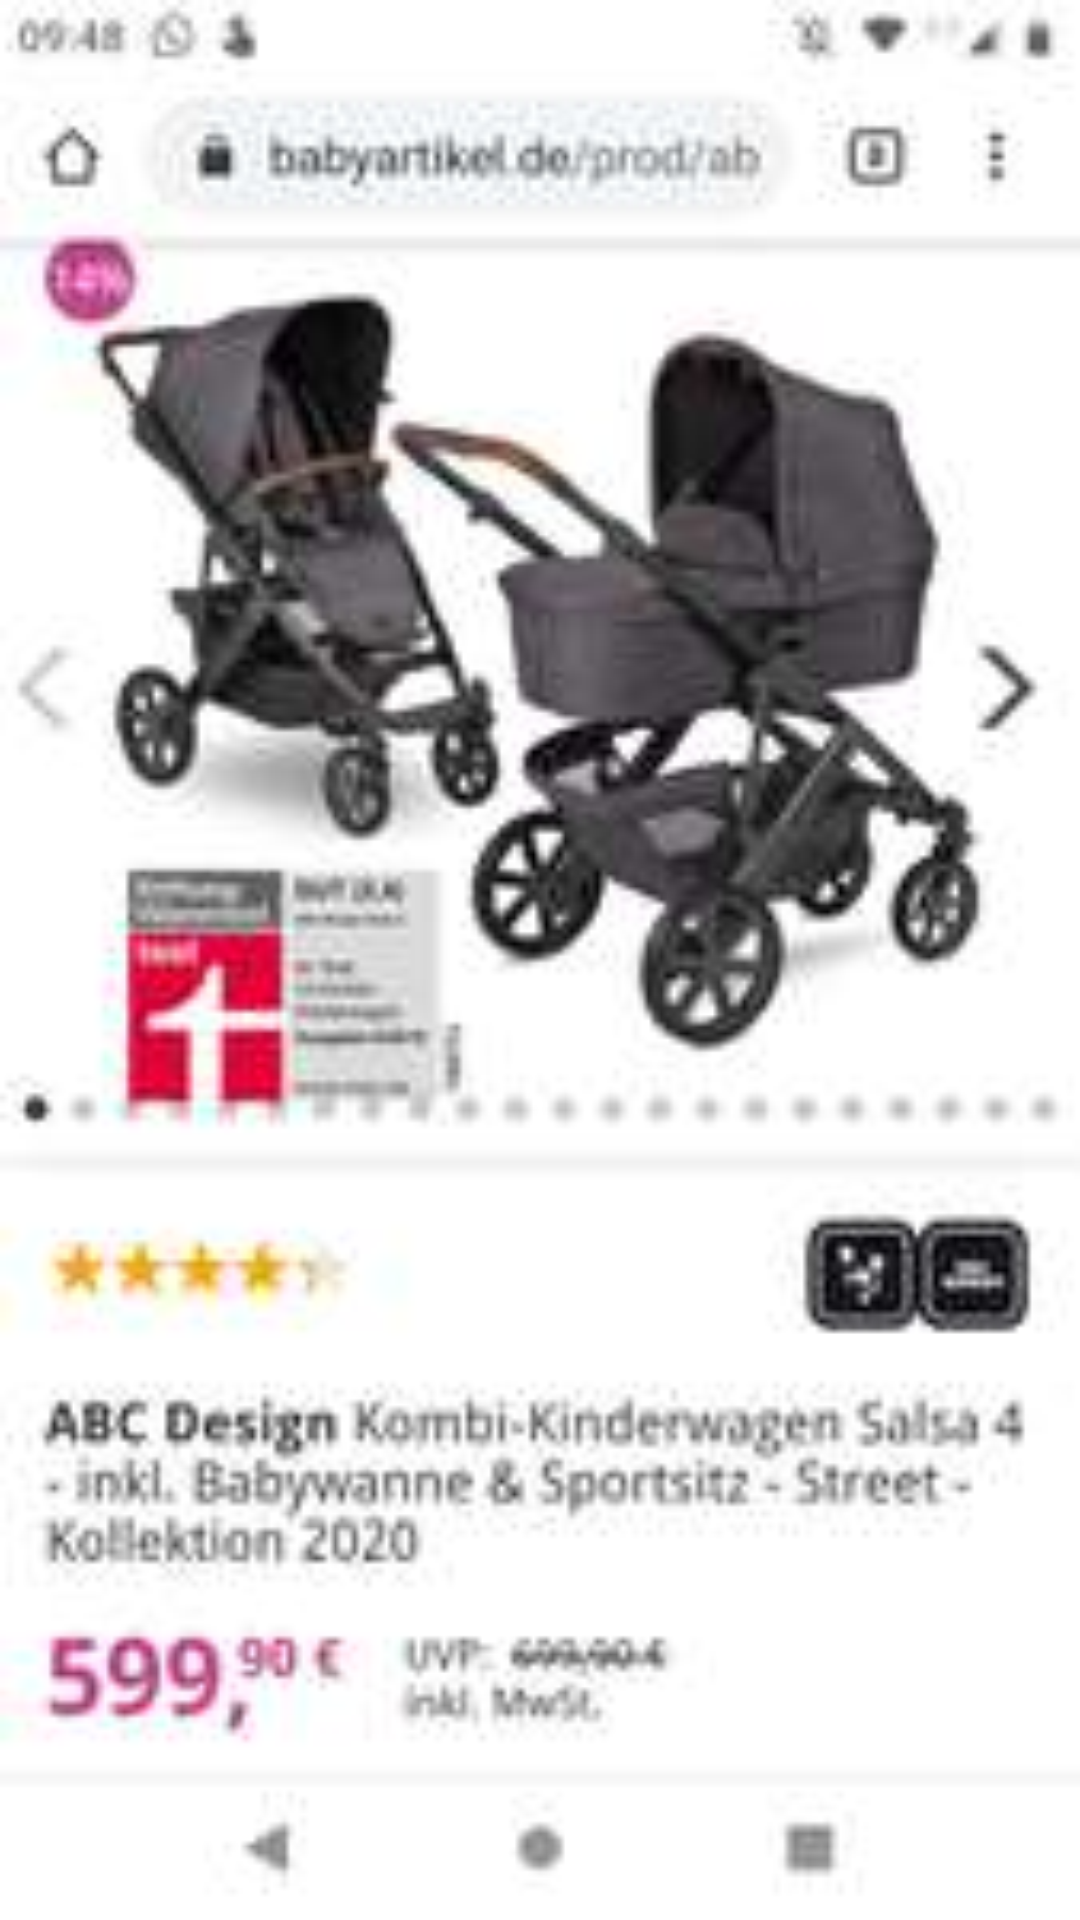 Kinderwagen ABC Design Salsa 4 street Kollektion 2020